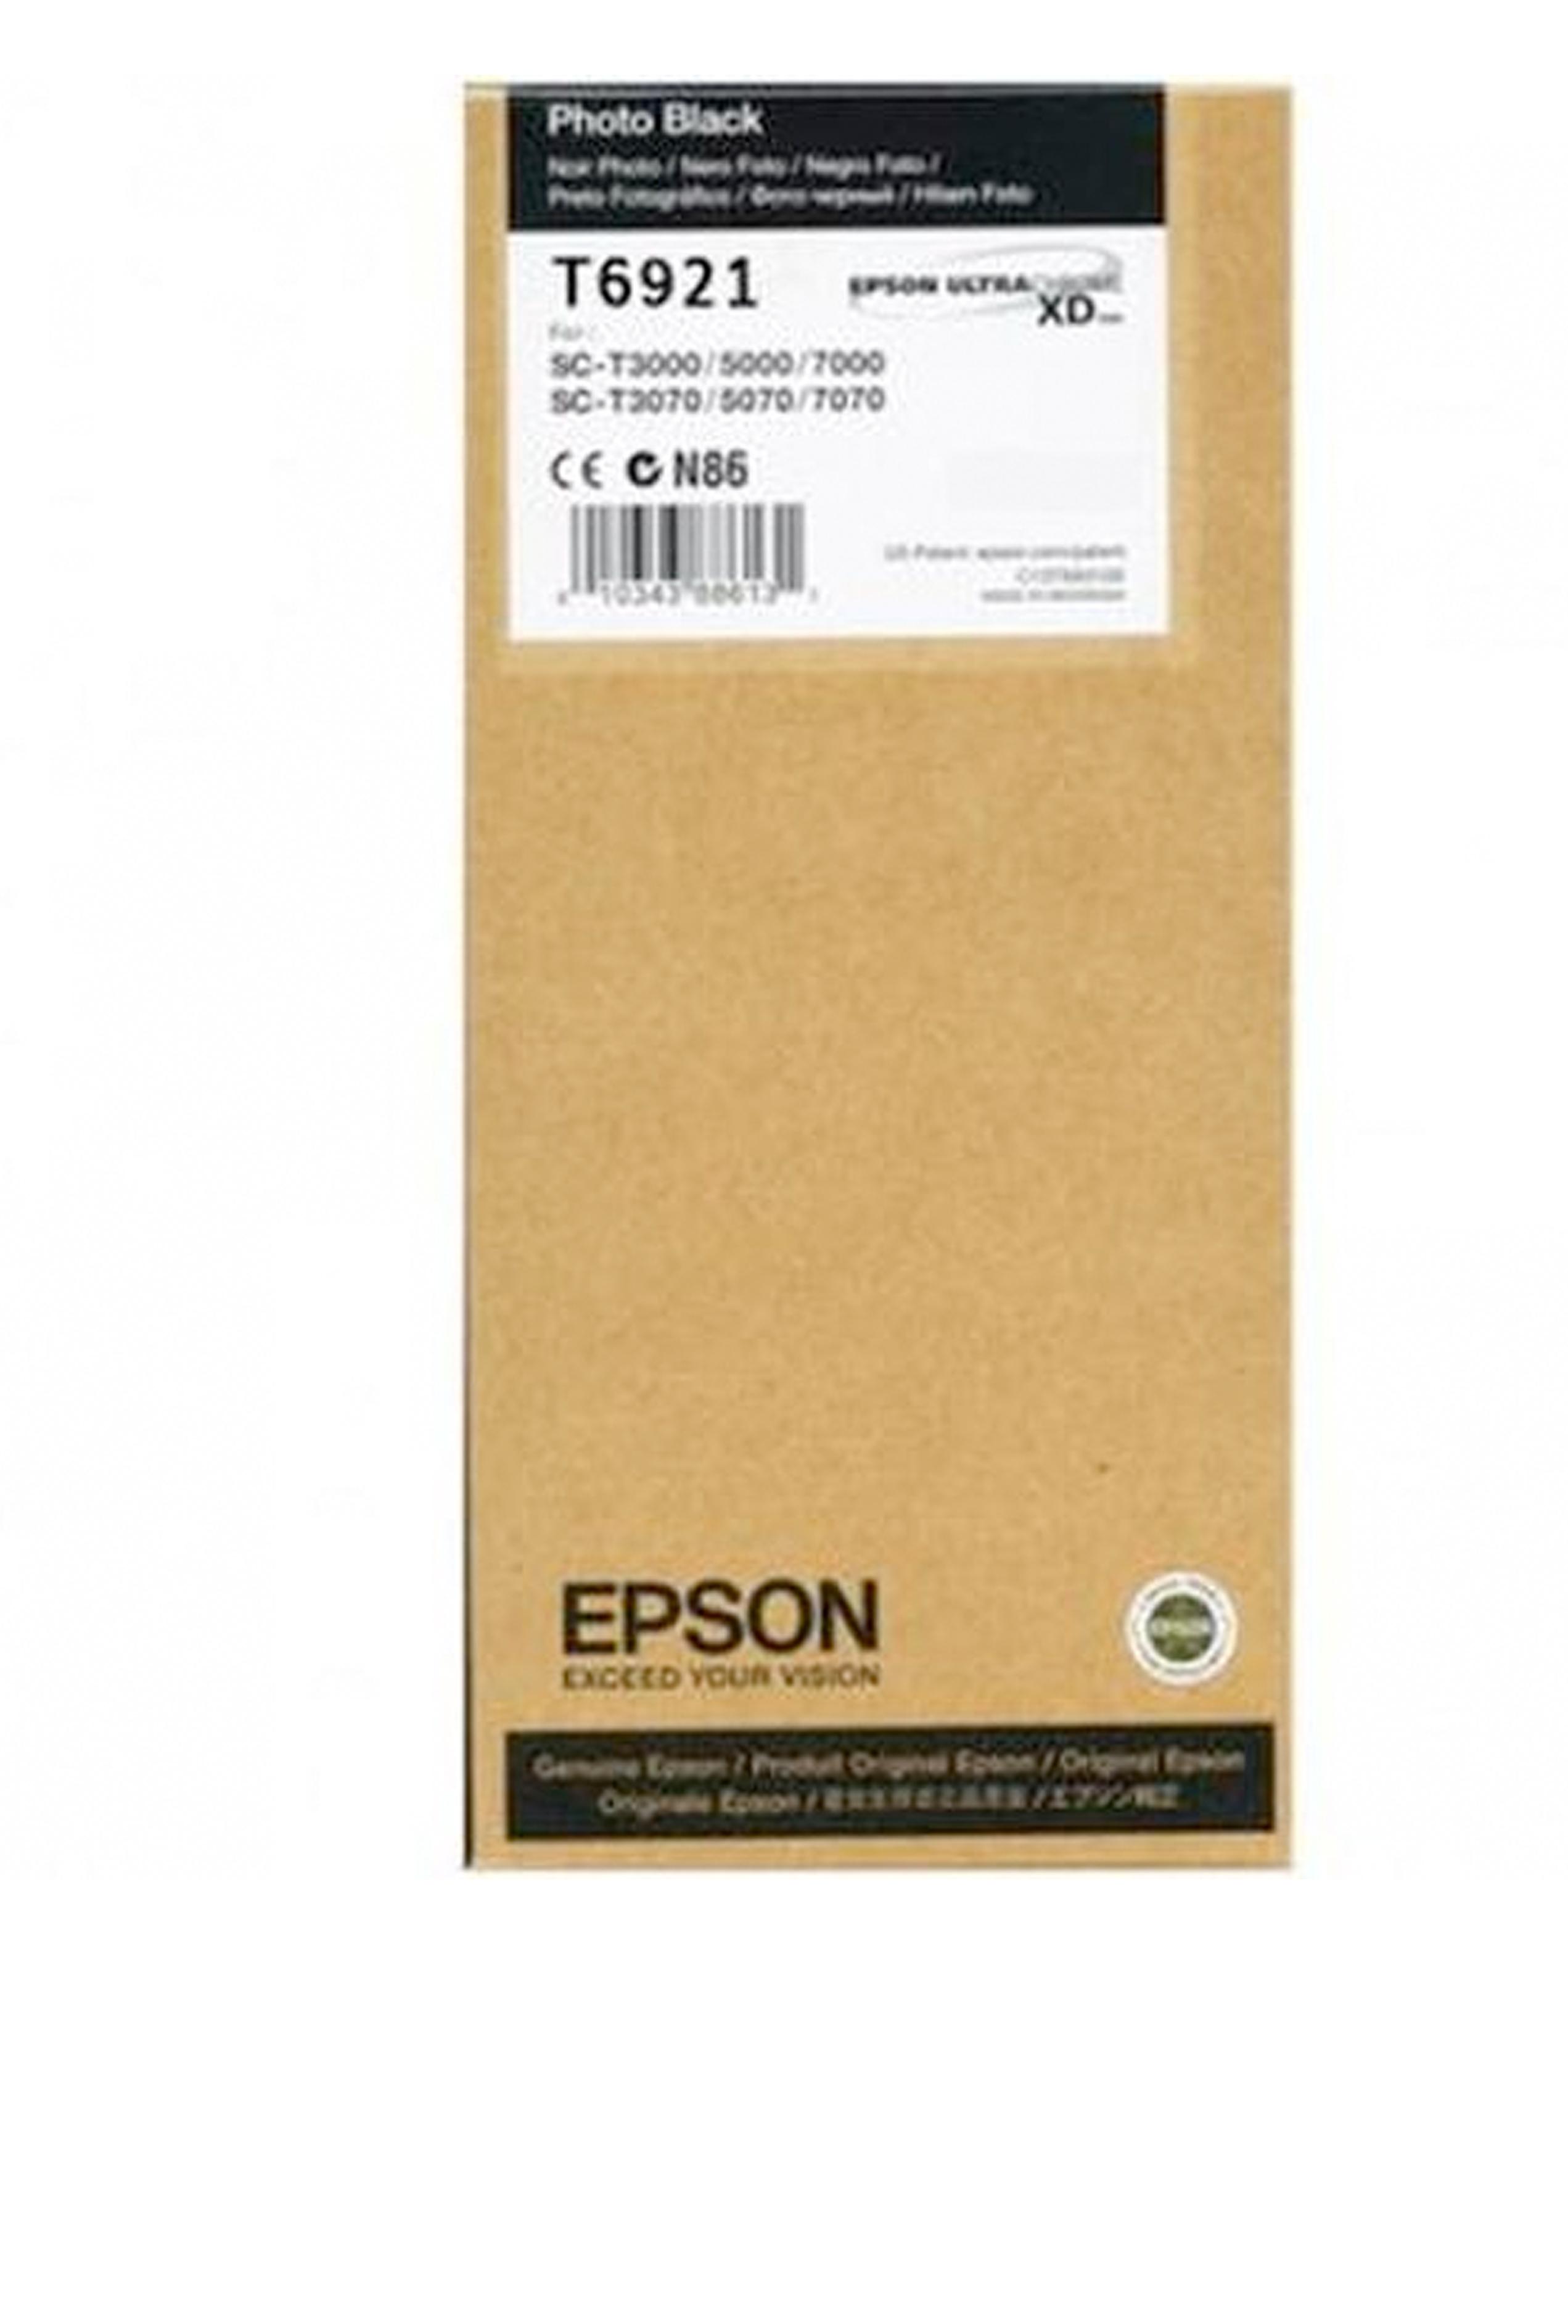 Epson EPSON LW PHOTO BLACK INK (110 ML) (T692100)